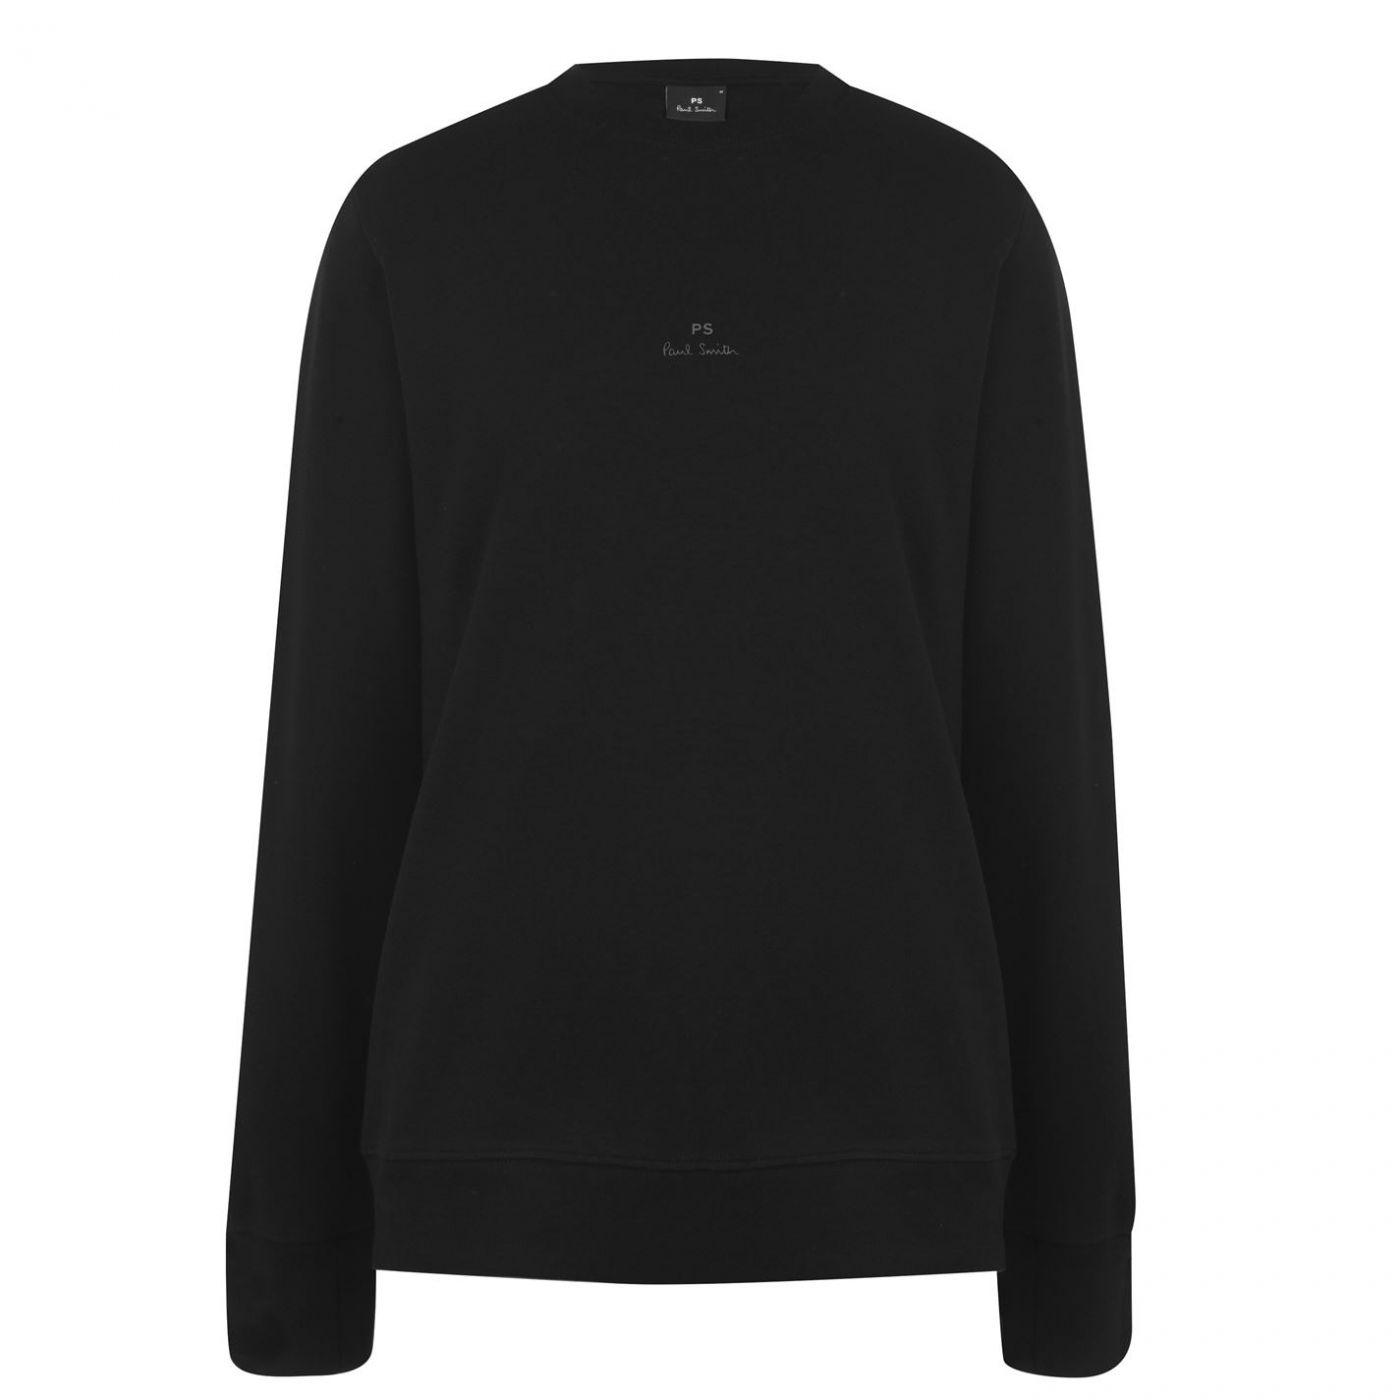 PS by Paul Smith Mercerised Crew Neck Sweatshirt